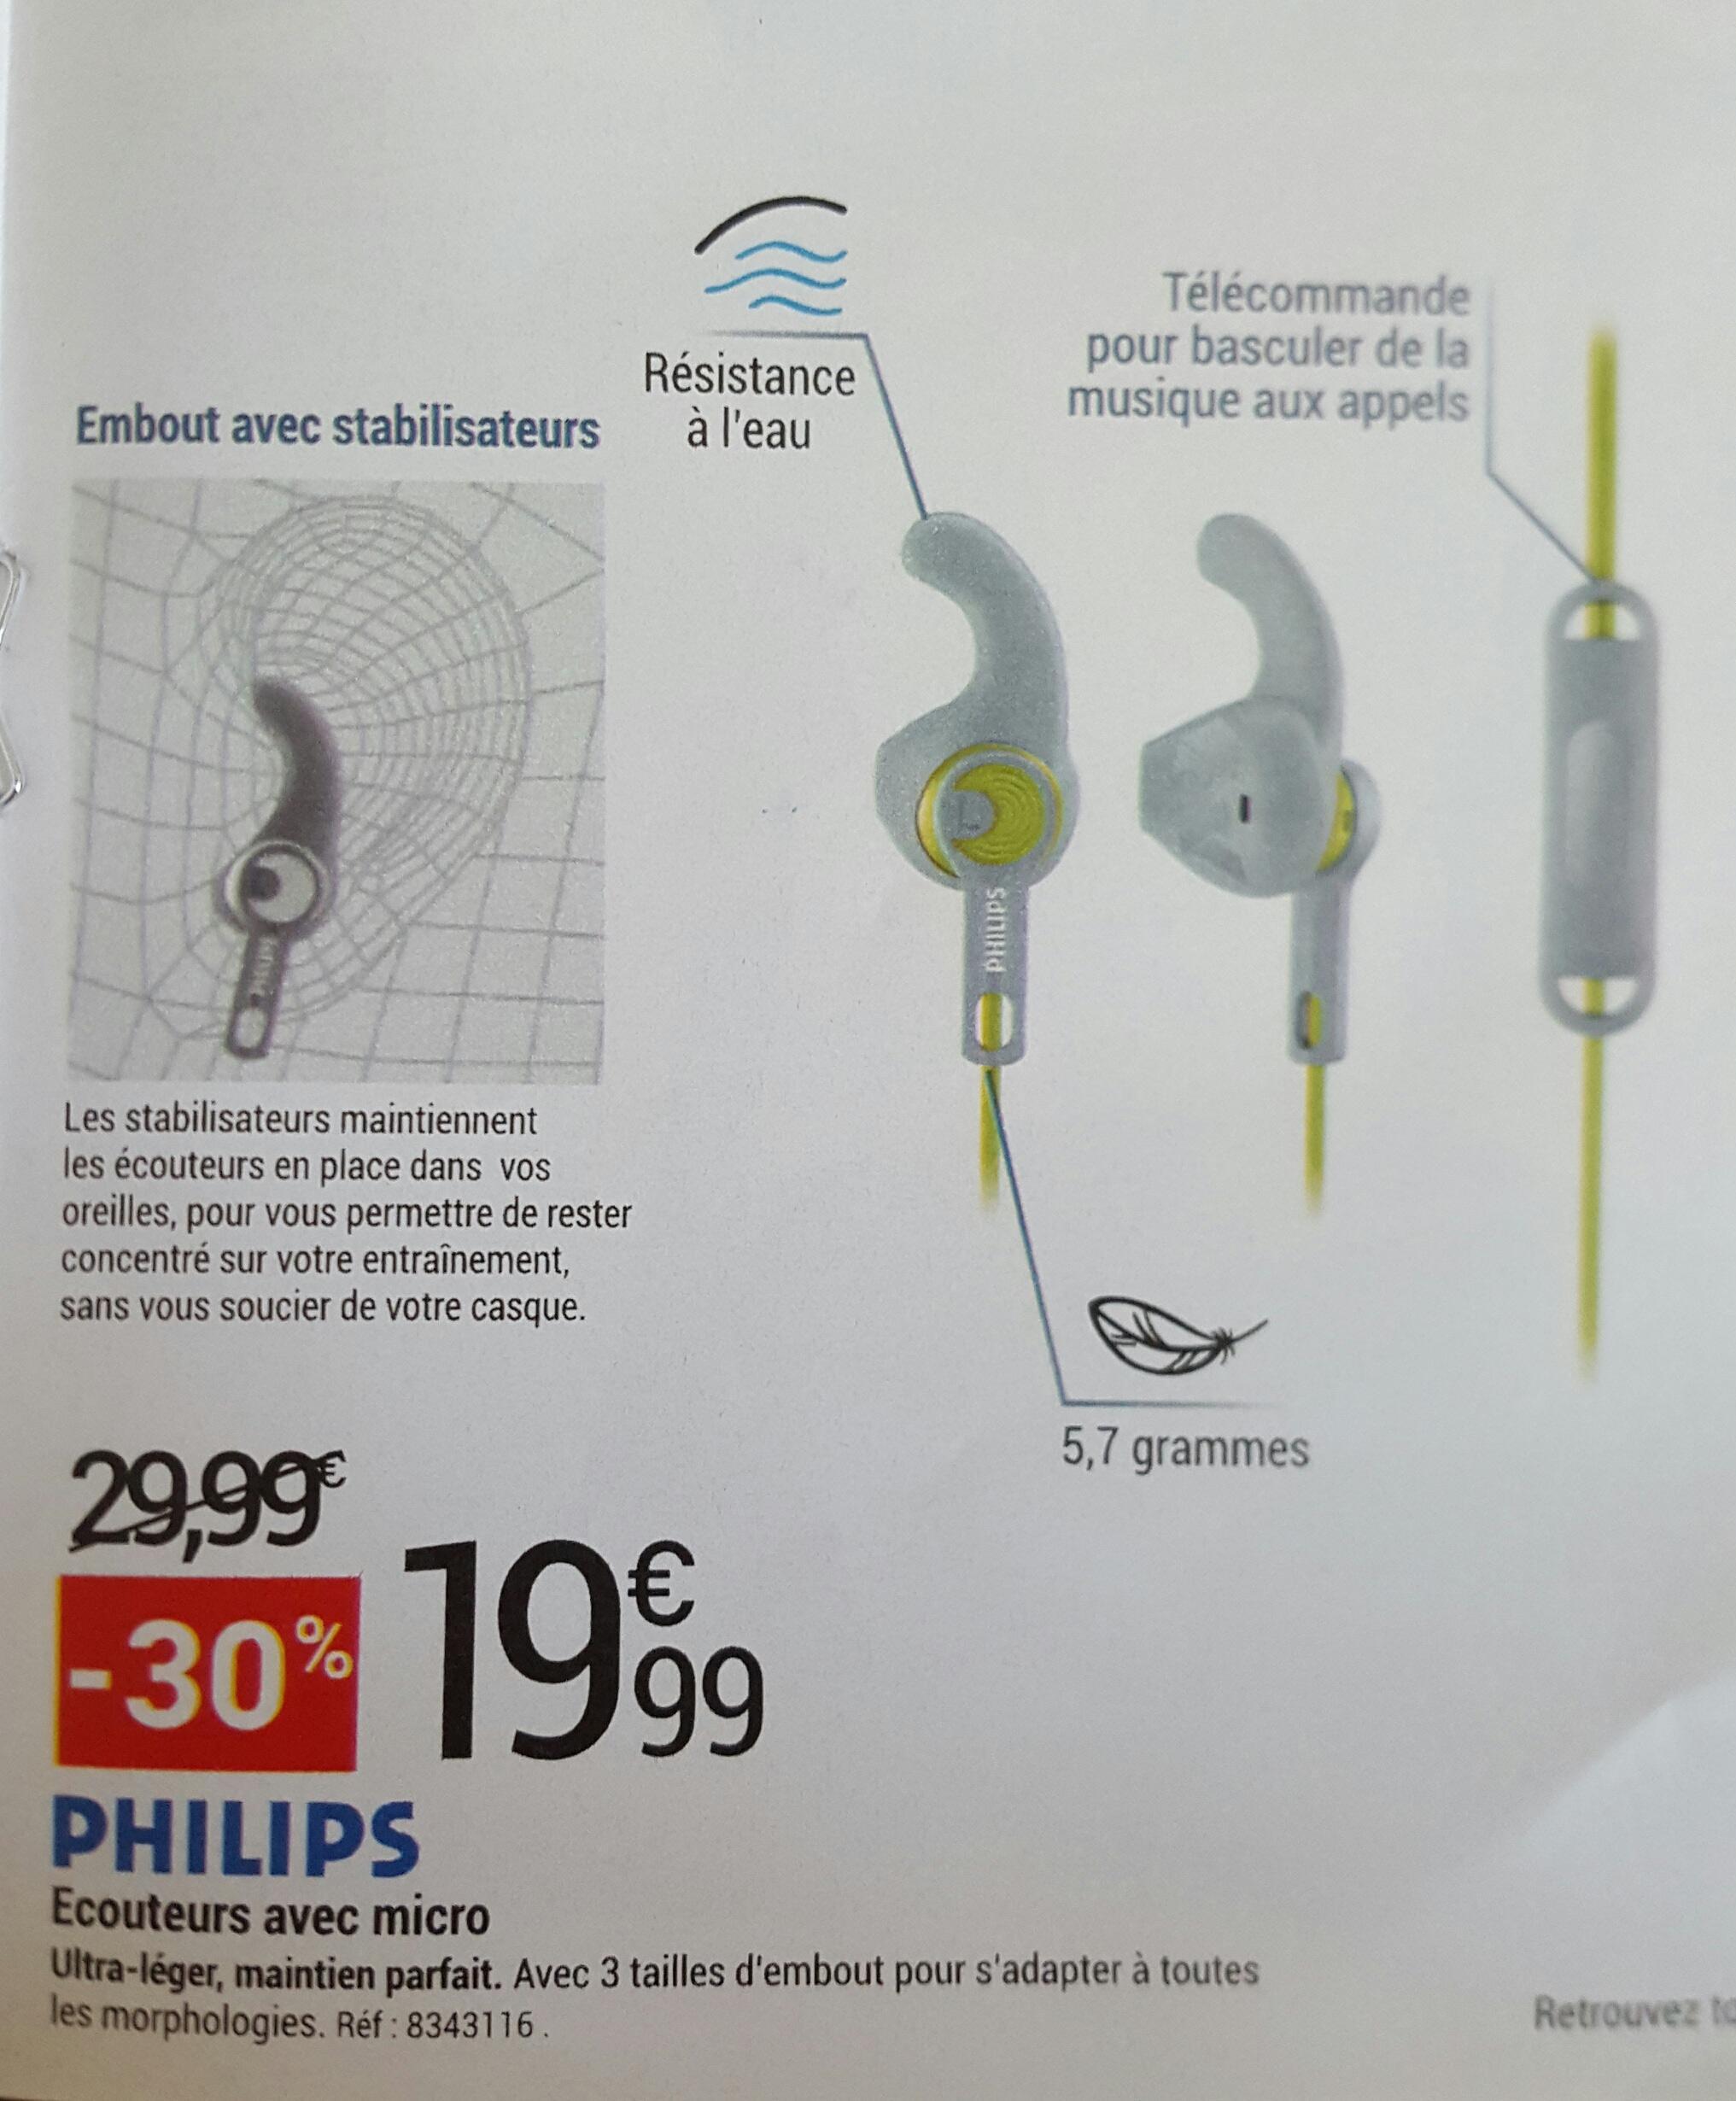 Ecouteurs intra-auriculaire Phillips Actionfit SHQ1305 - Micro + embouts stabilisateurs